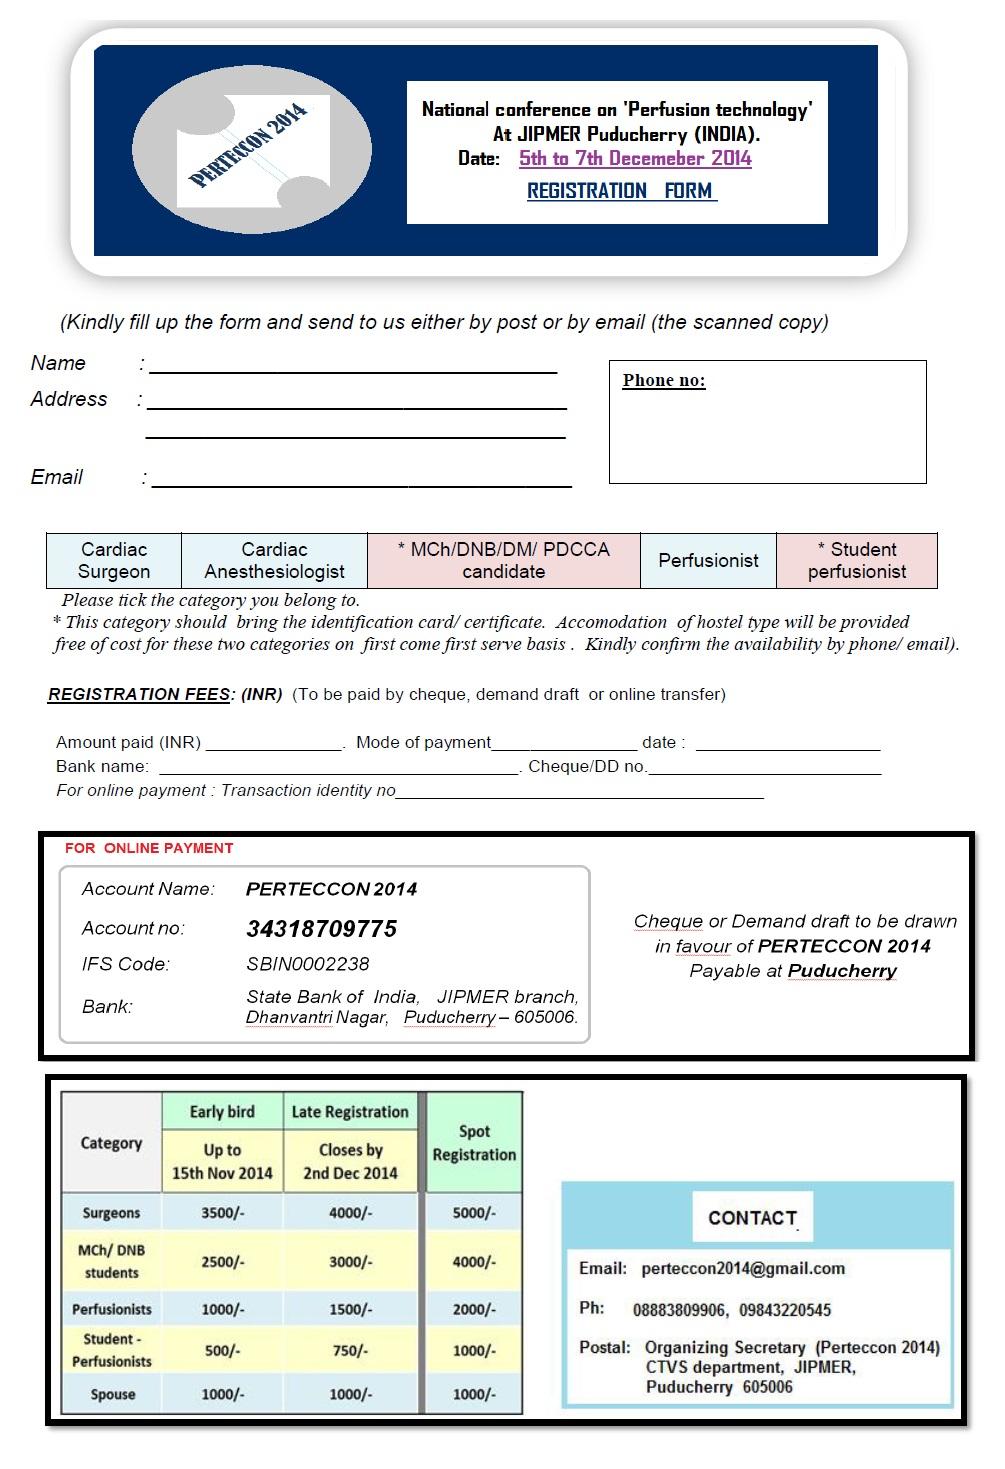 4. Registration form Perteccon 2014